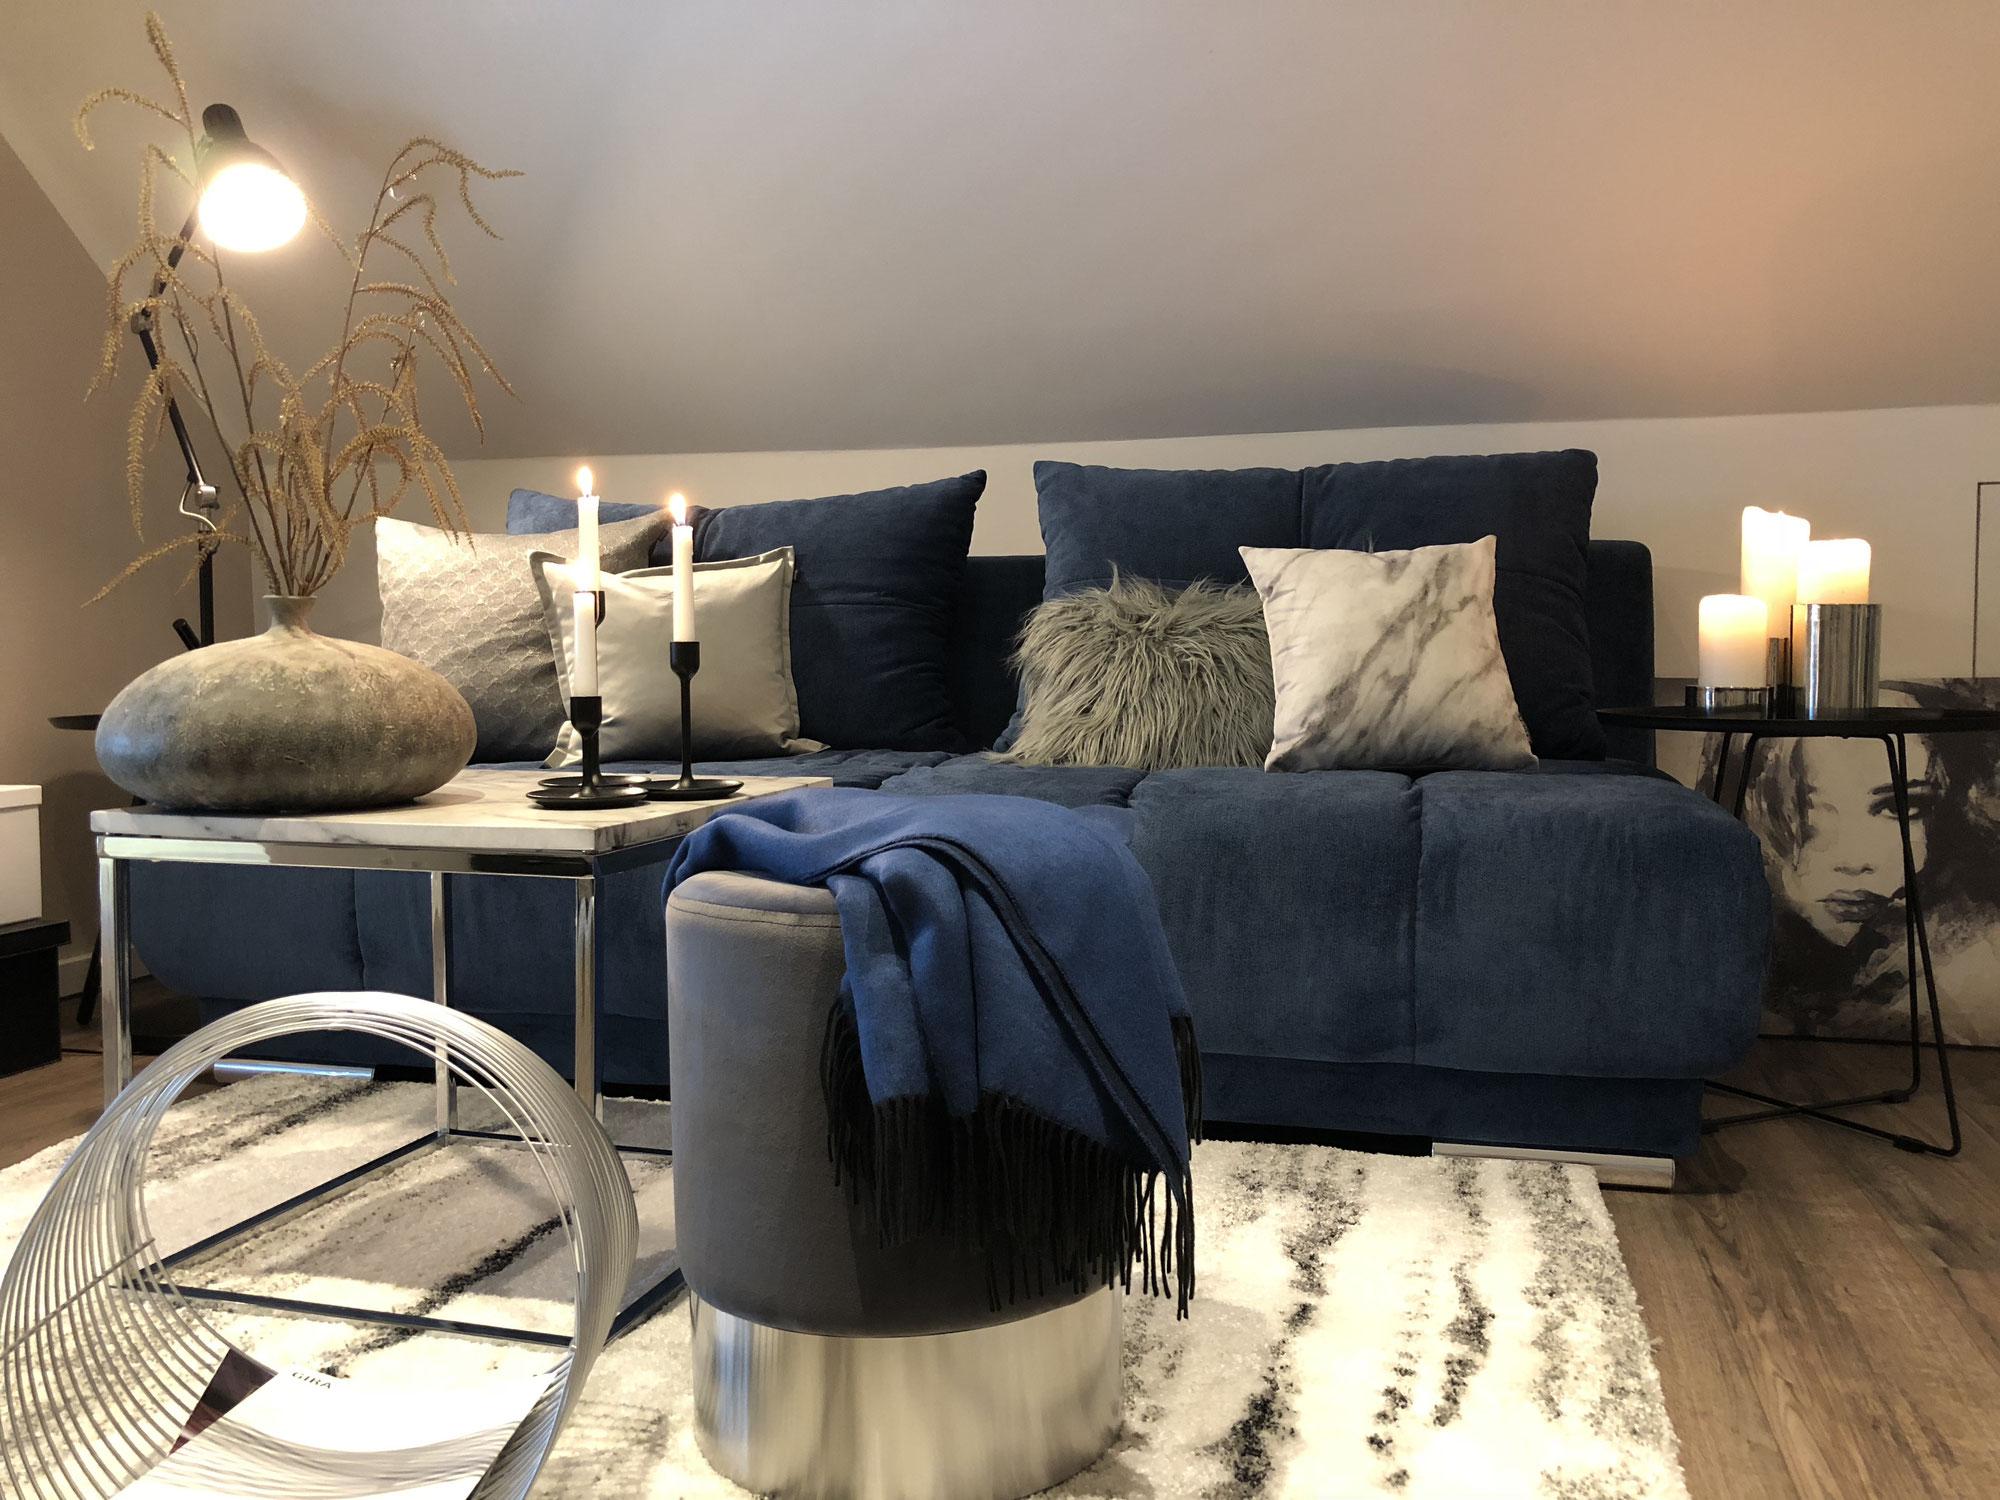 interior by kati lifestyle interiorblogger. Black Bedroom Furniture Sets. Home Design Ideas